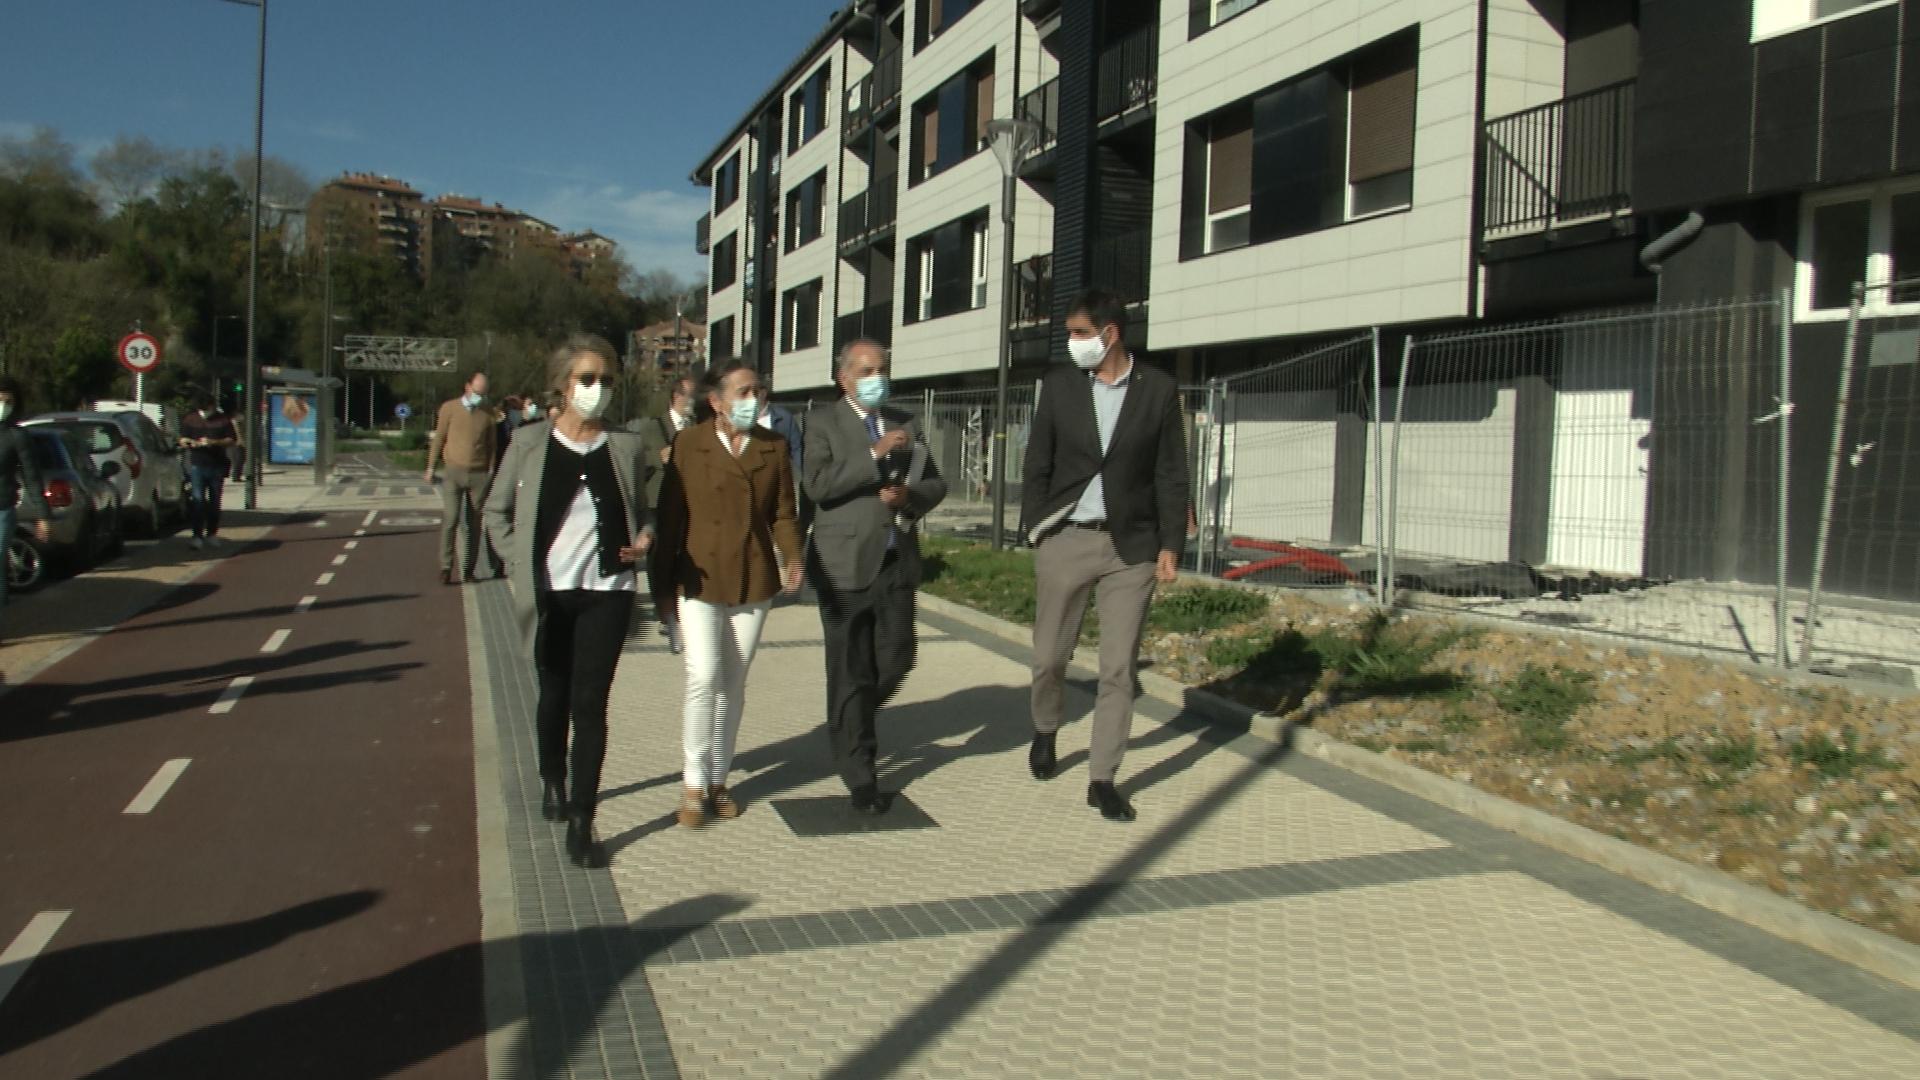 Visita oficial a Txomin esta mañana. Foto: Gobierno vasco